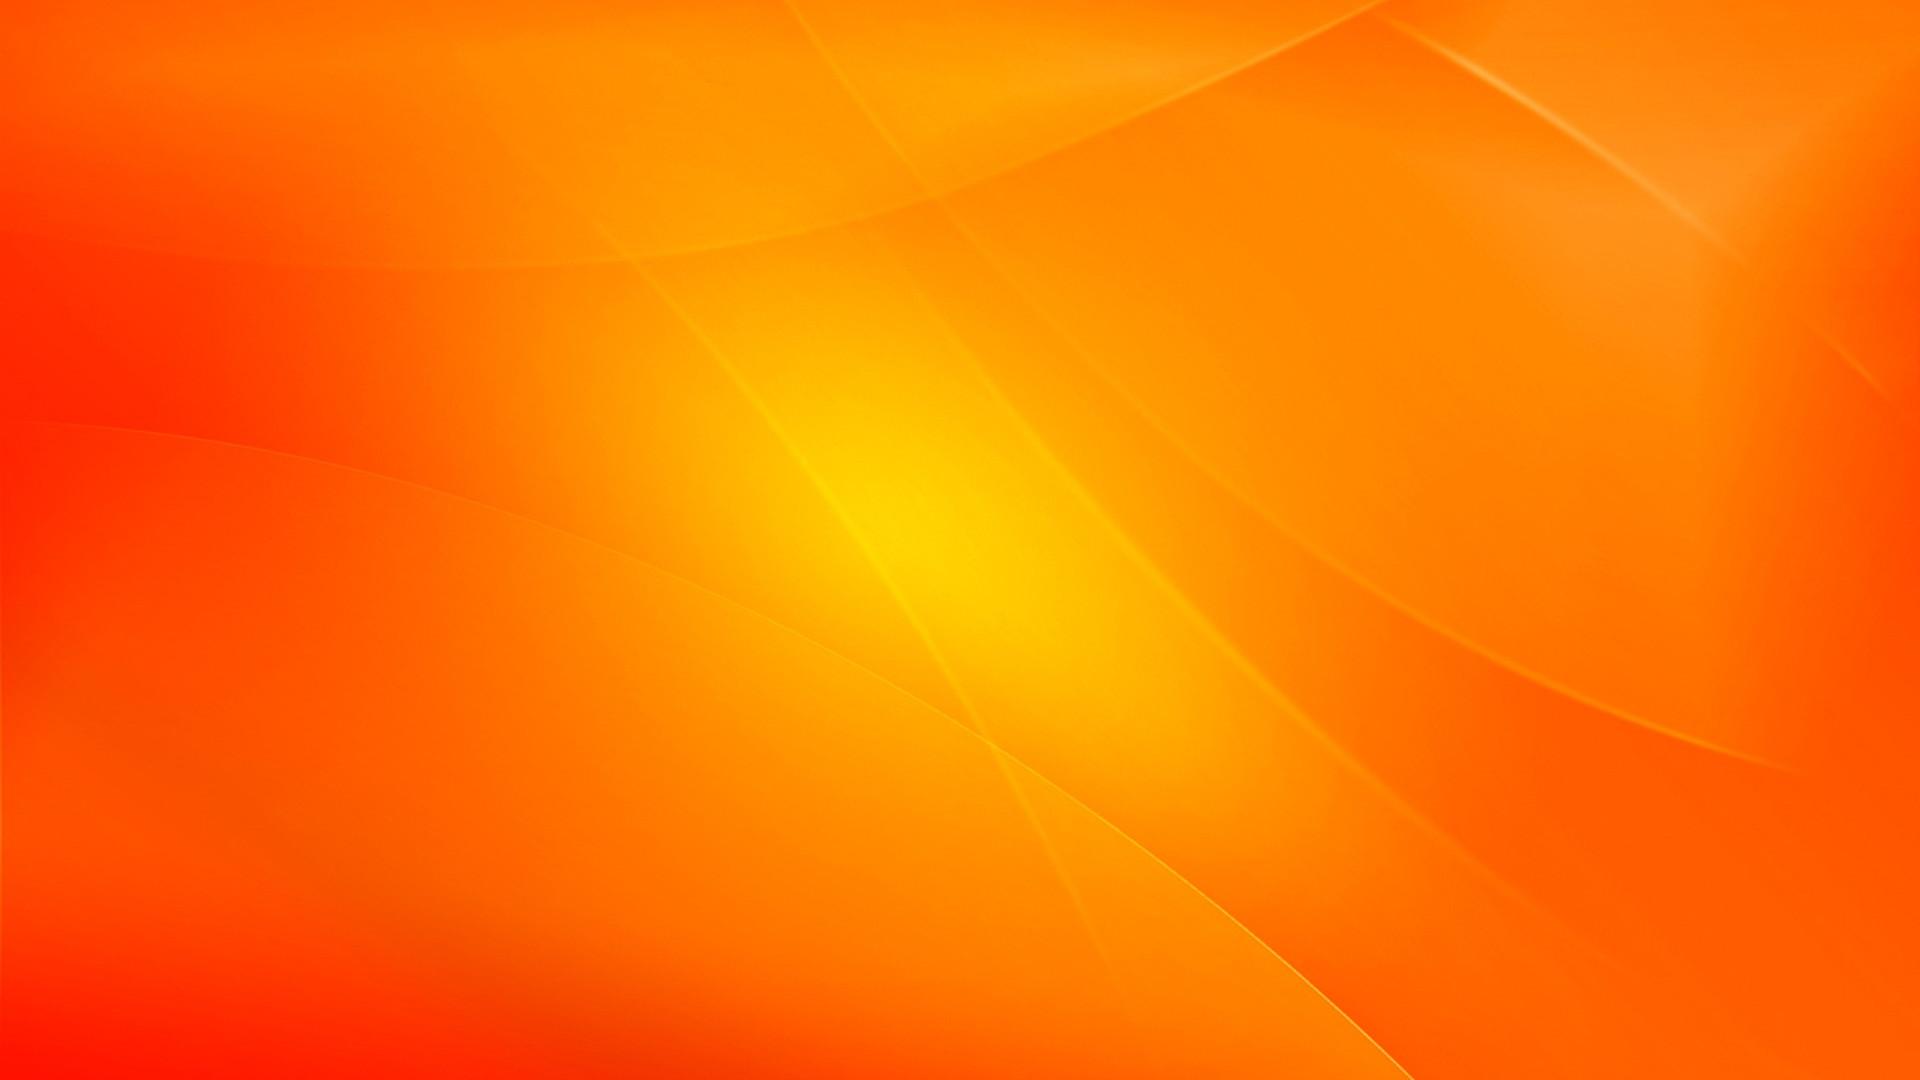 Best Wallpaper Hd For Iphone 6 Background Orange Abstract Wallpaper 28378 Baltana